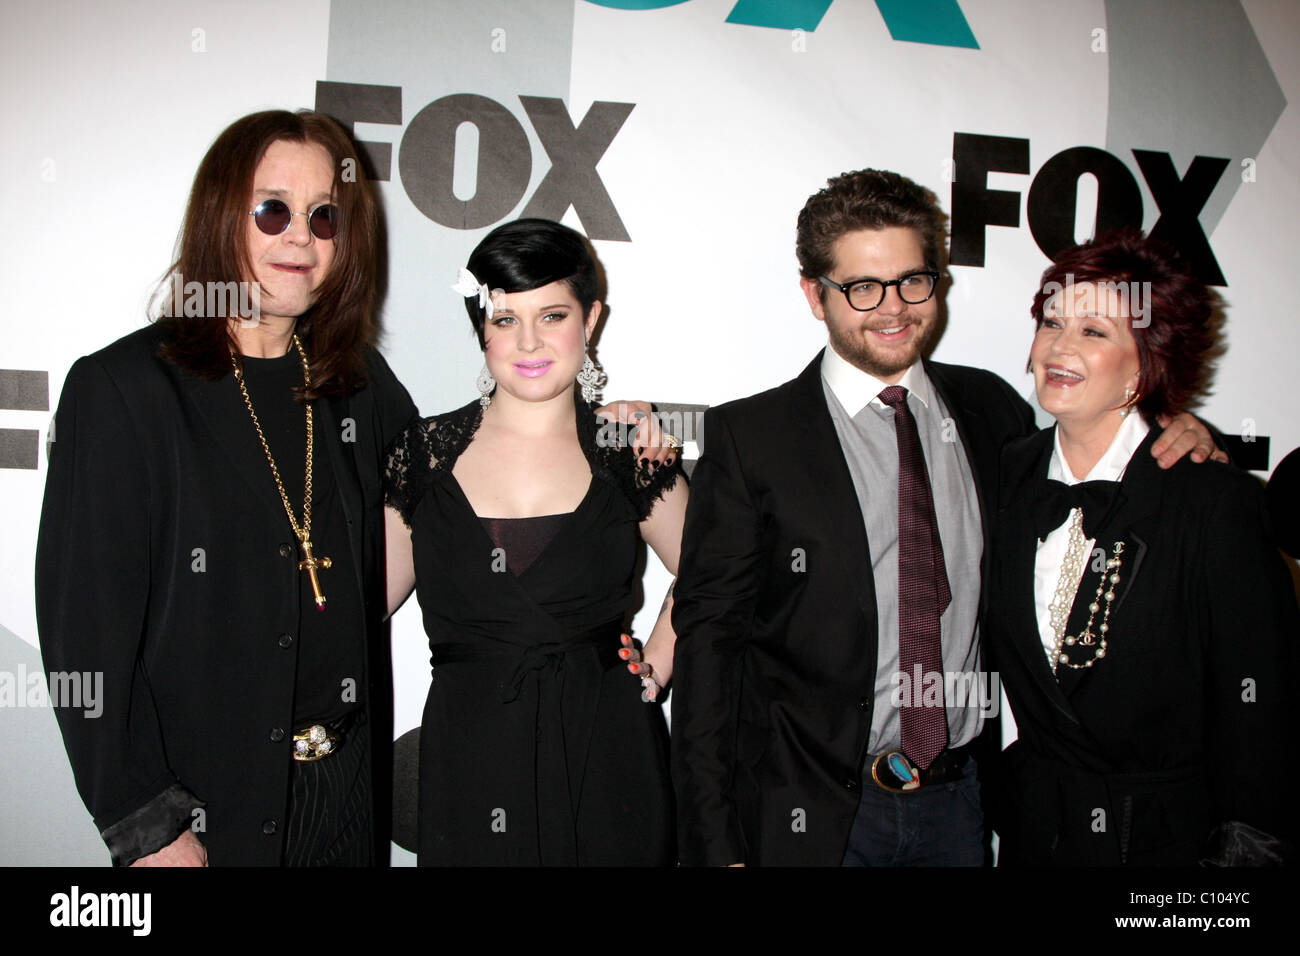 Ozzy Osbourne, Kelly Osbourne, Jack Osbourne and Sharon Osbourne Fox TV  Winter All Star Party at MyHouse - Arrivals - Stock Image